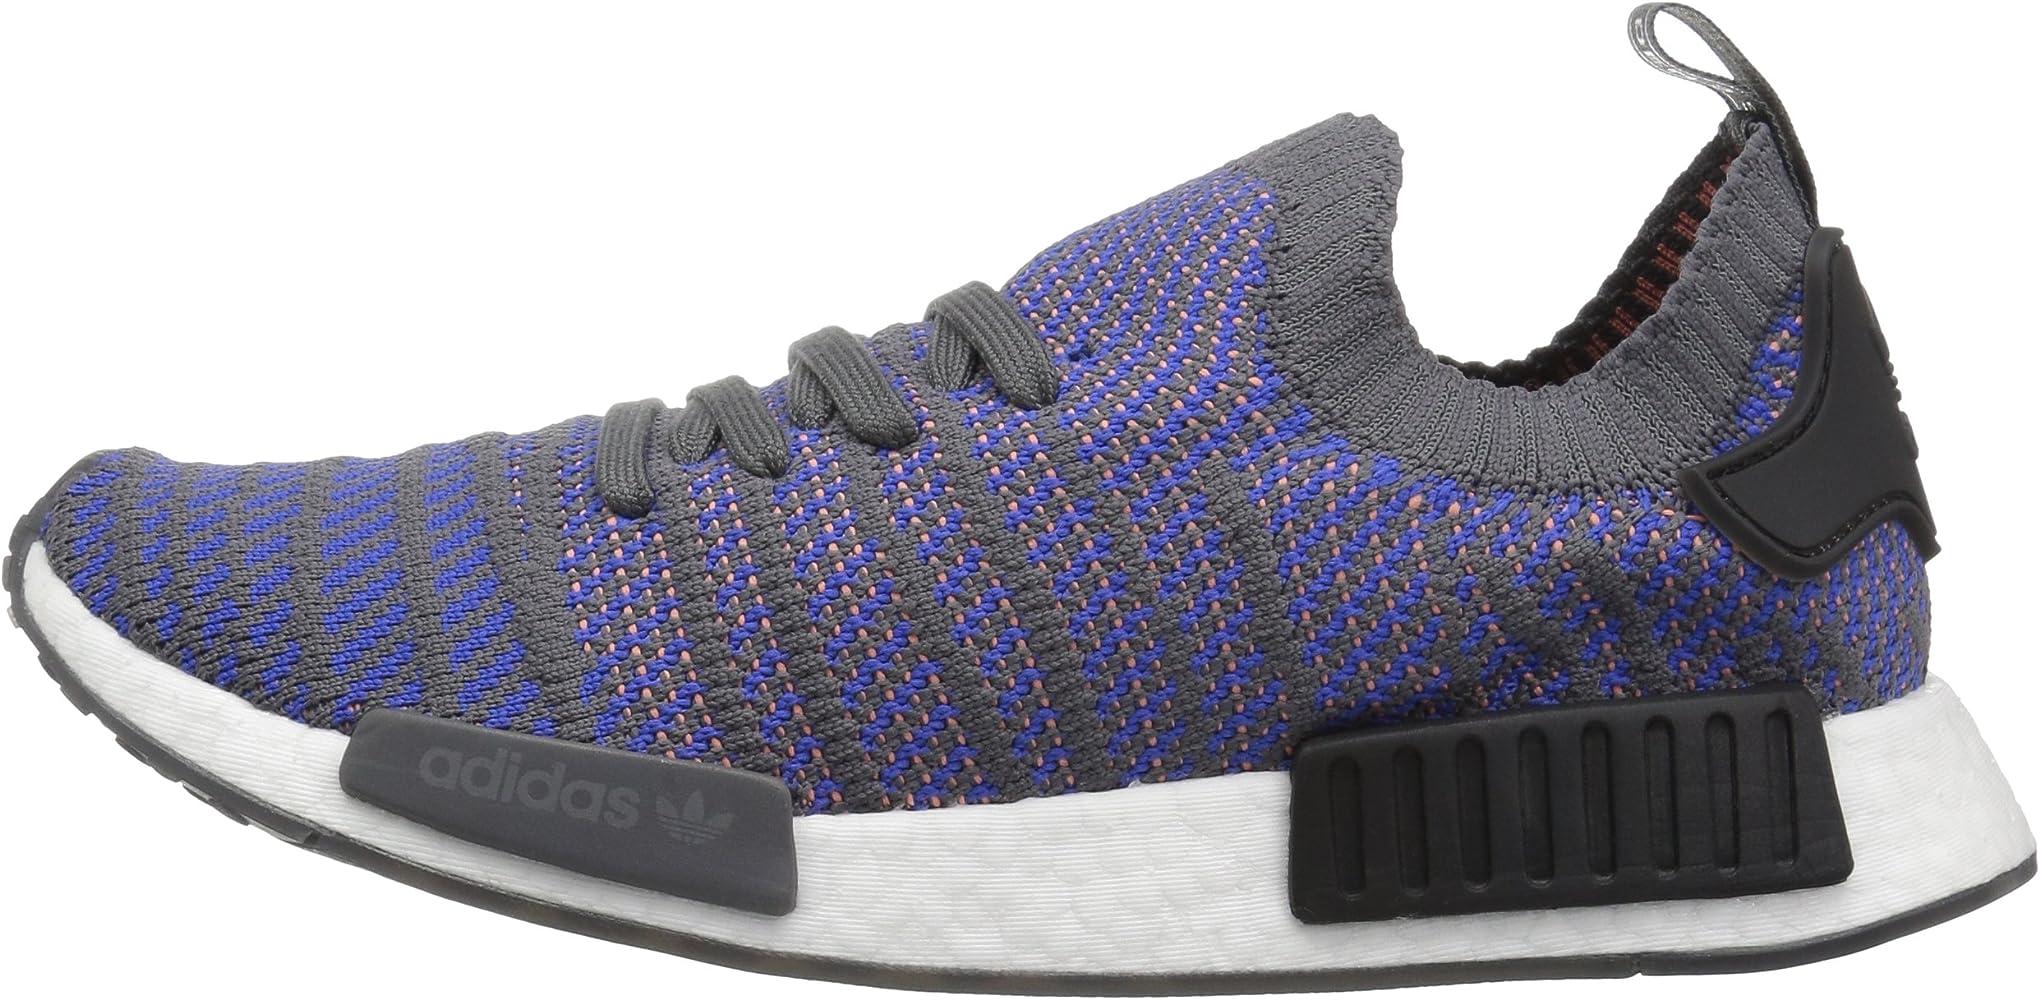 Adidas Originals NMD R1 STLT PK Men BlueBlack CQ2388